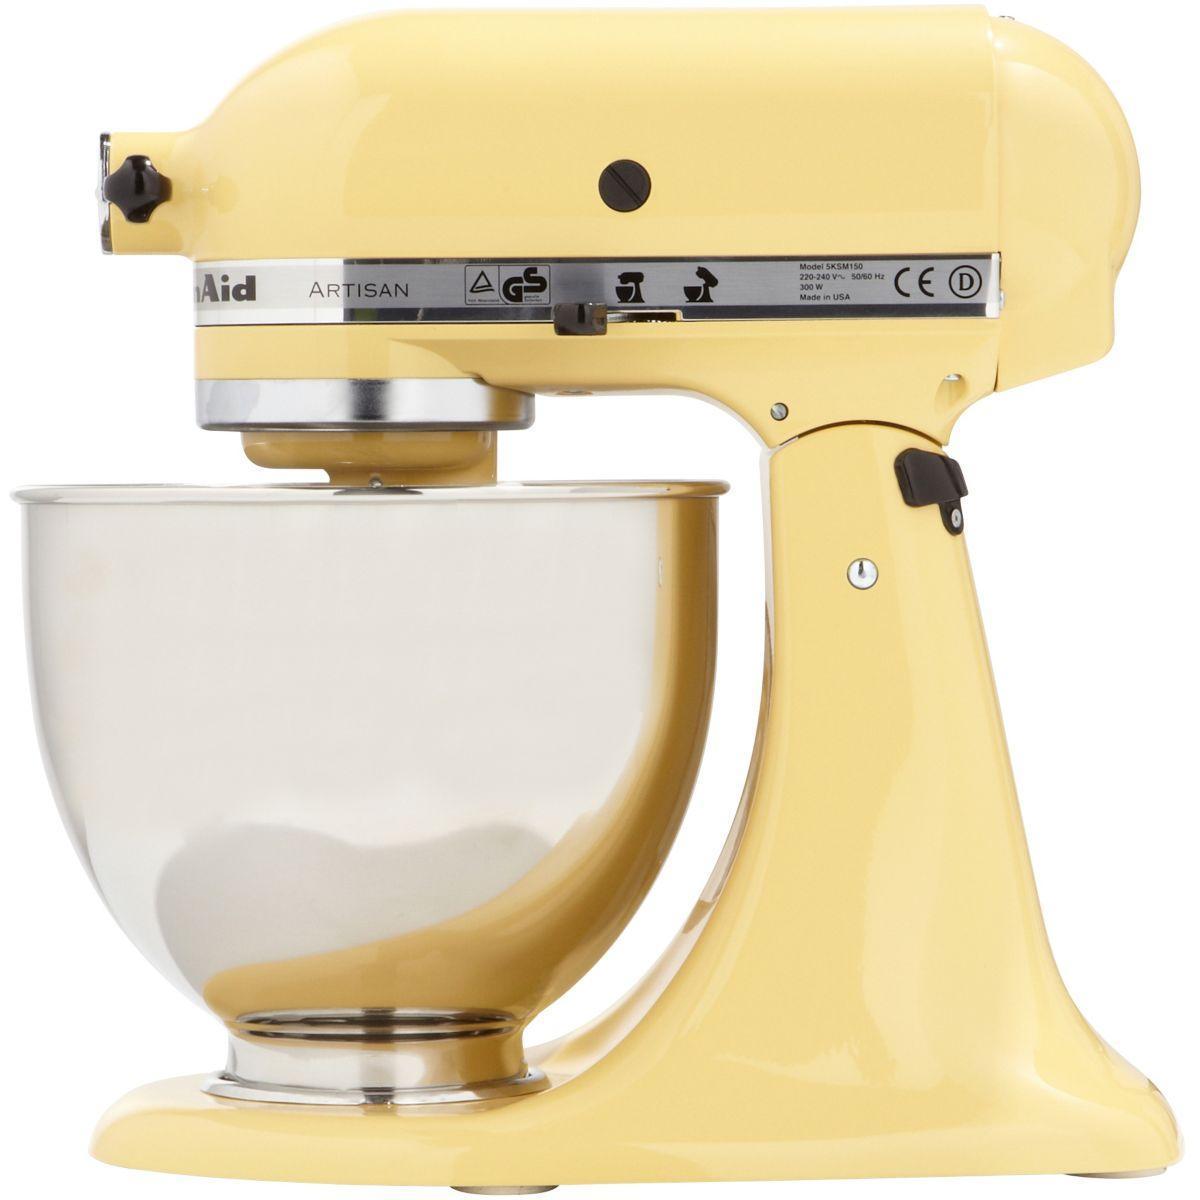 robot p tissier sur socle kitchenaid artisan 5ksm150ps emy jaune pastel reconditionn back. Black Bedroom Furniture Sets. Home Design Ideas